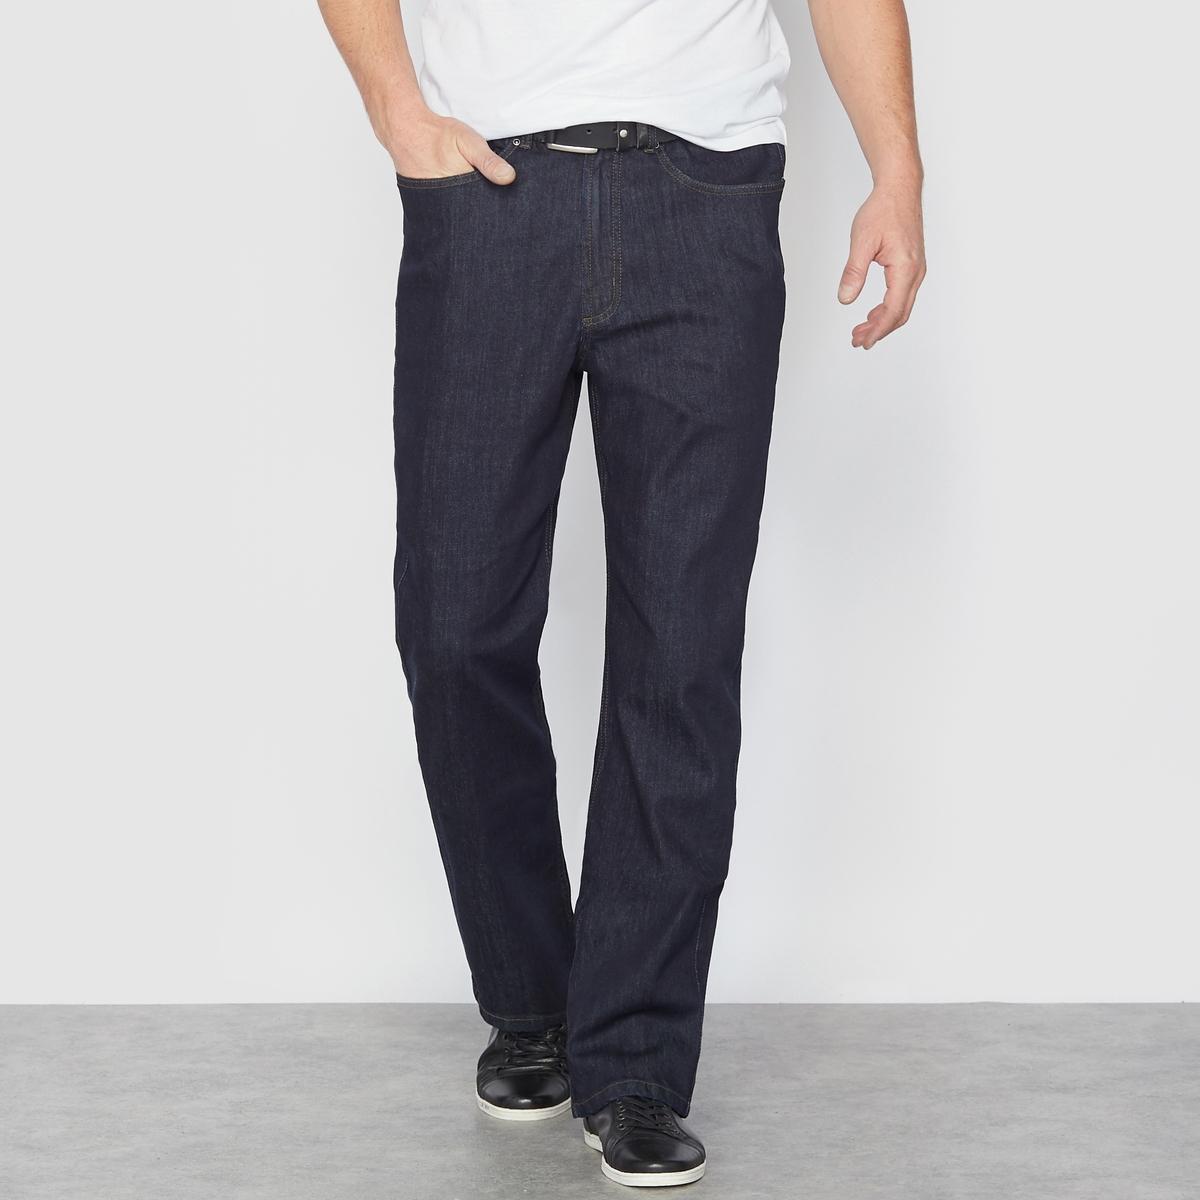 Jeans stretch corte standard, cós elástico, comp. 1